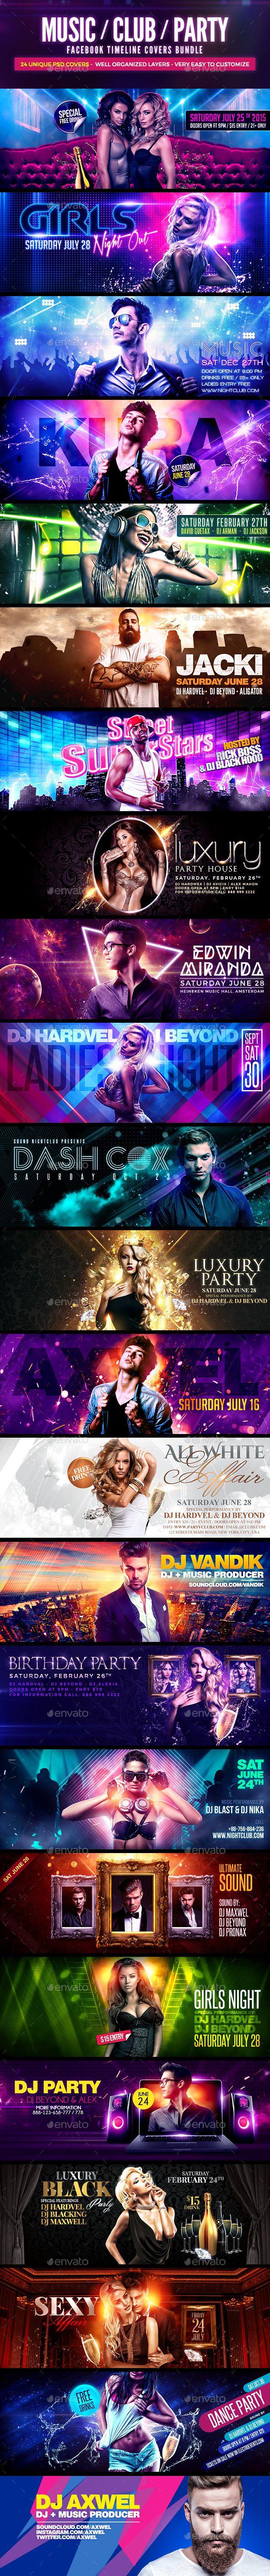 24 DJs Facebook Covers PSD Bundle Template #design Download: http://graphicriver.net/item/24-djs-facebook-covers-psd-bundle/12256796?ref=ksioks